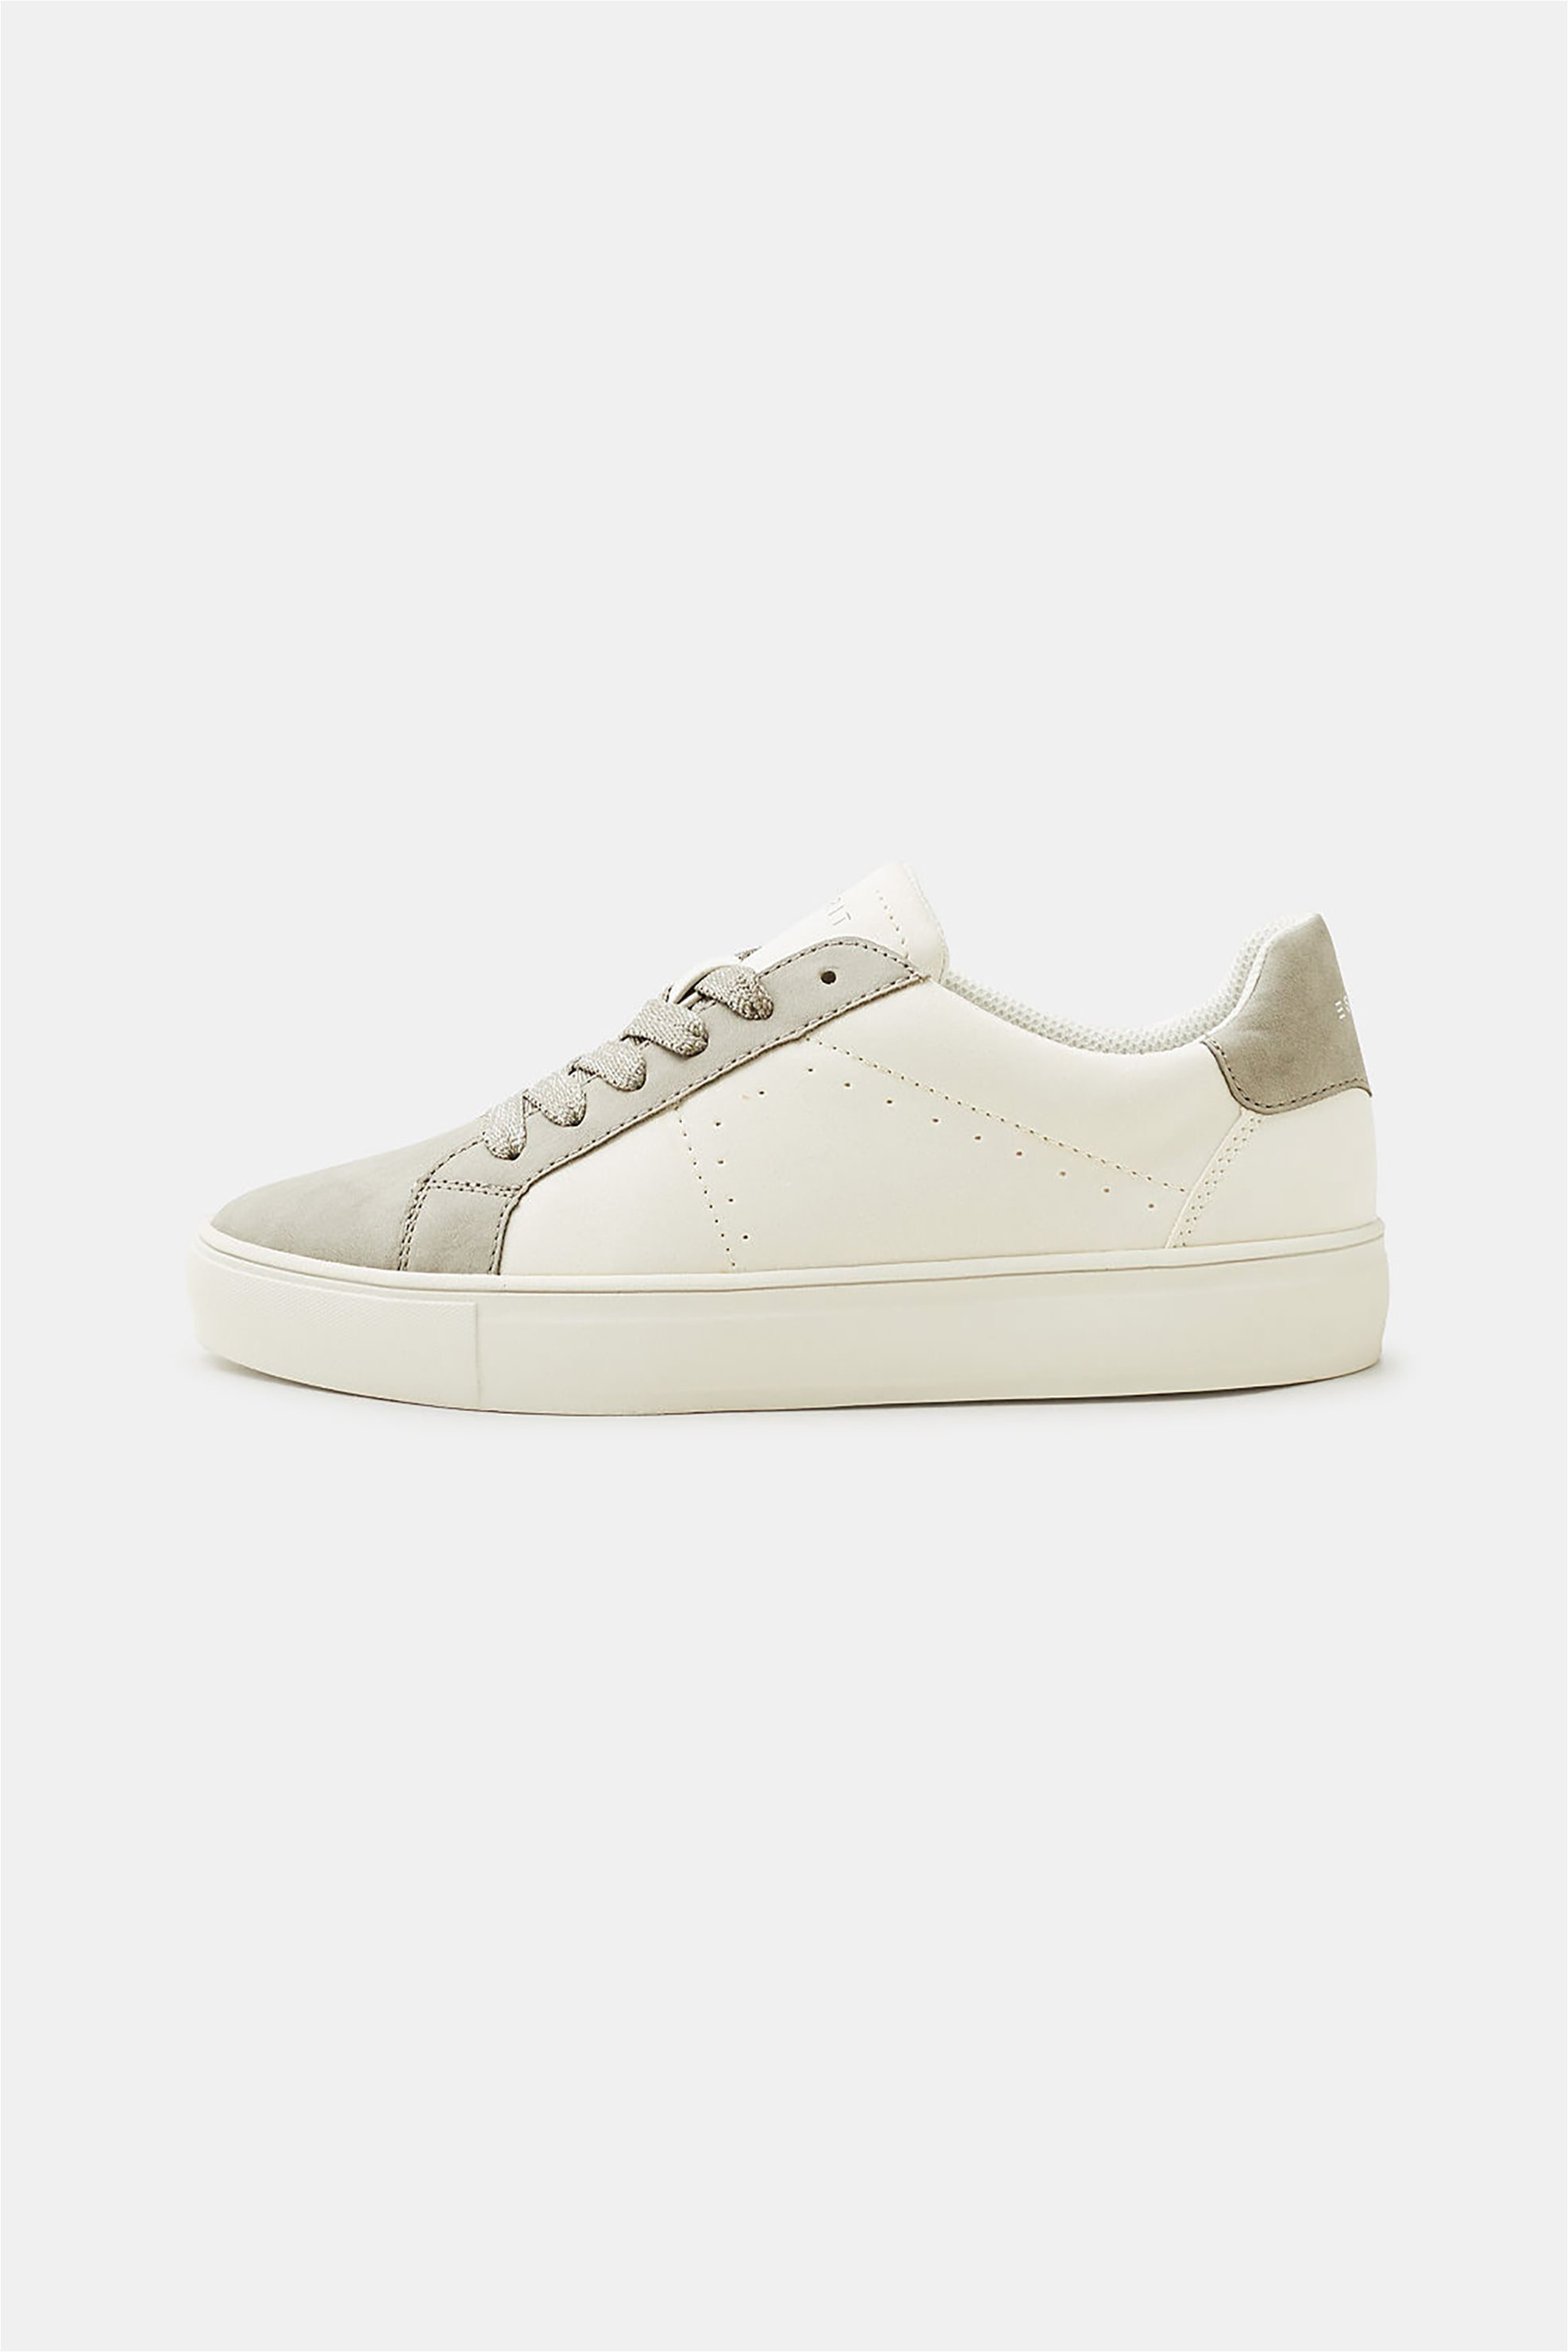 731f40cb85c Esprit γυναικεία sneakers με faux suede λεπτομέρειες - 128EK1W003 - Εκρού